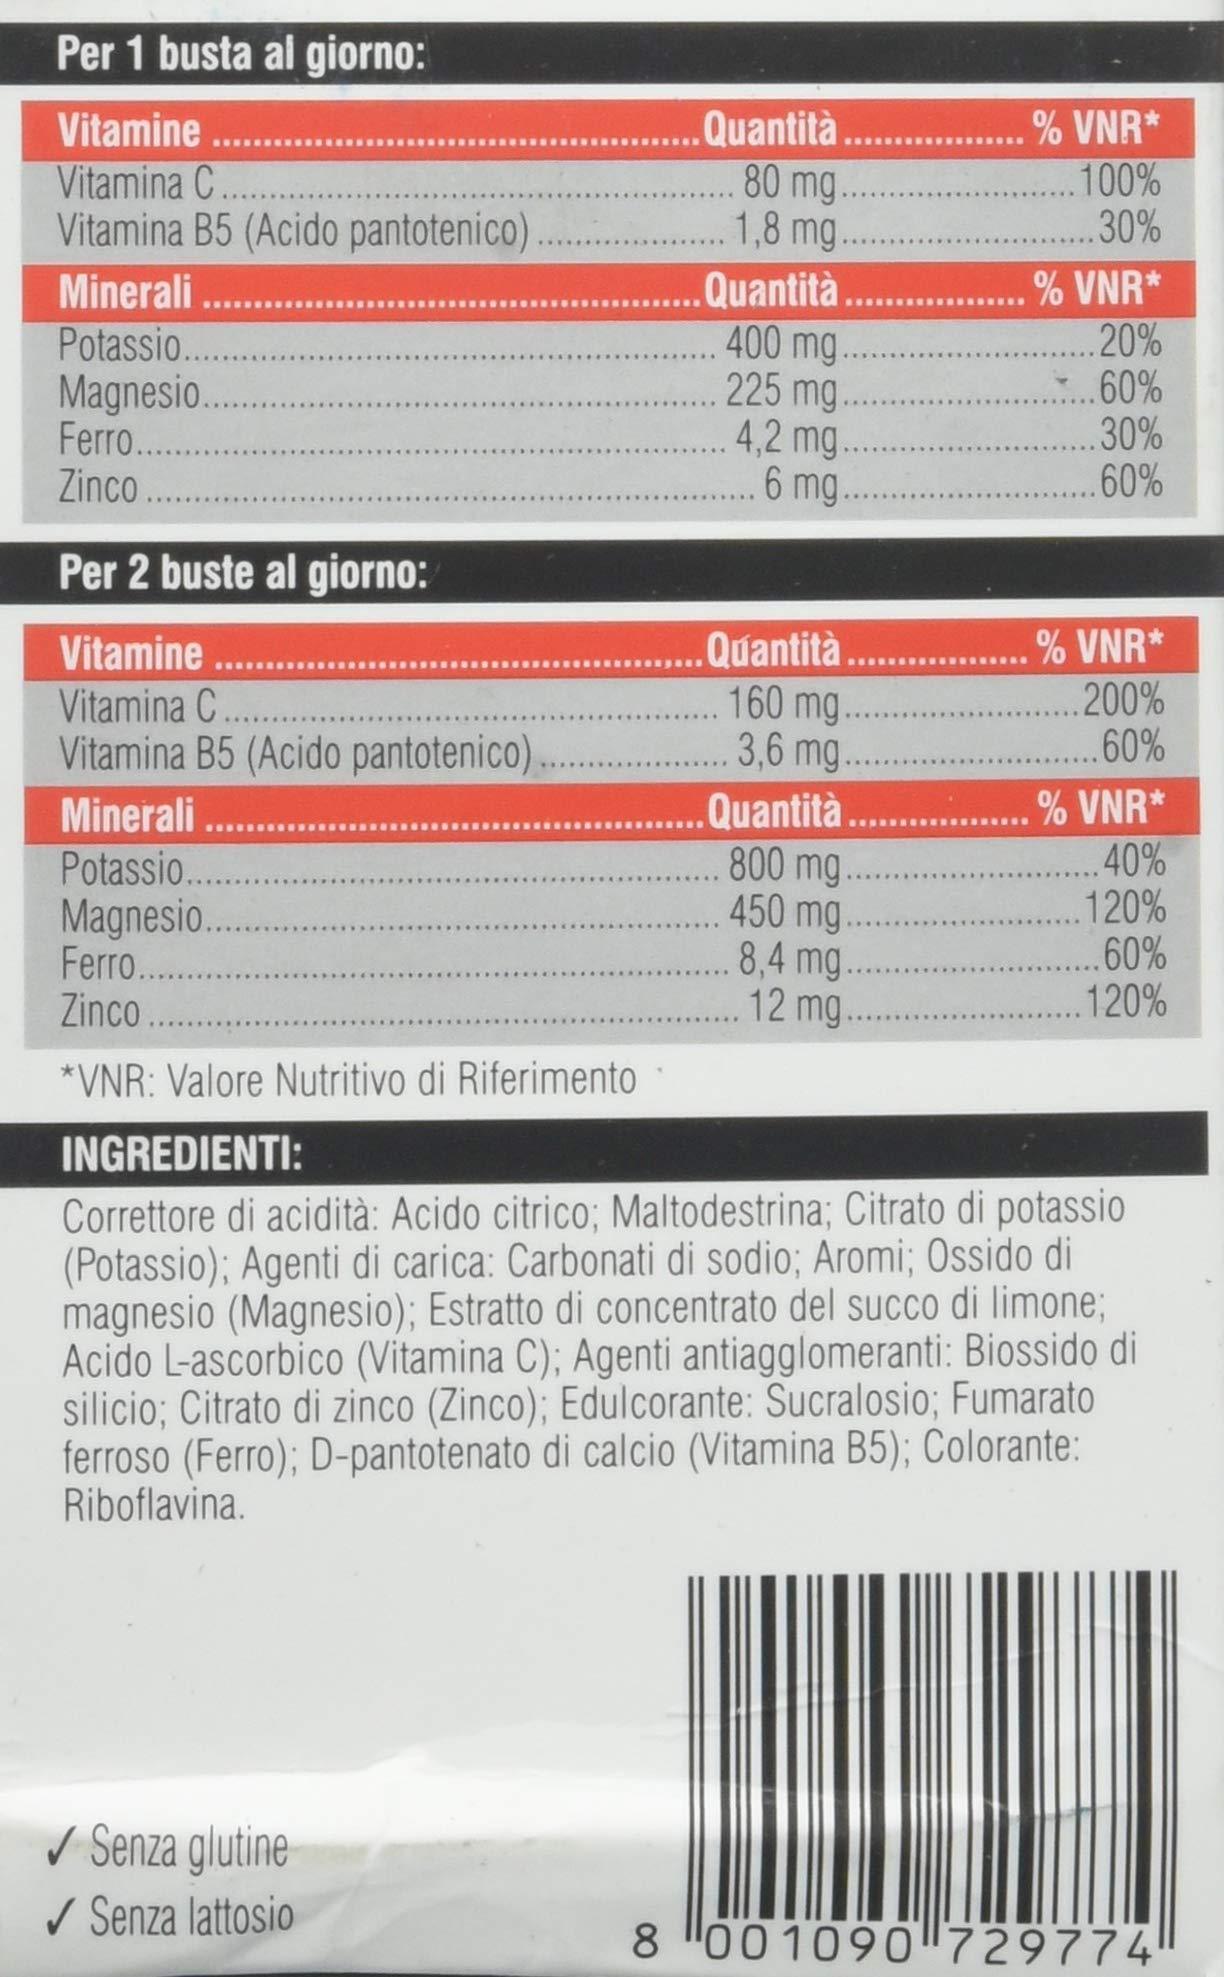 Swisse Magnesio e Potassio Forte, Integrazione di Sali minerali, 24 Bustine 5 spesavip